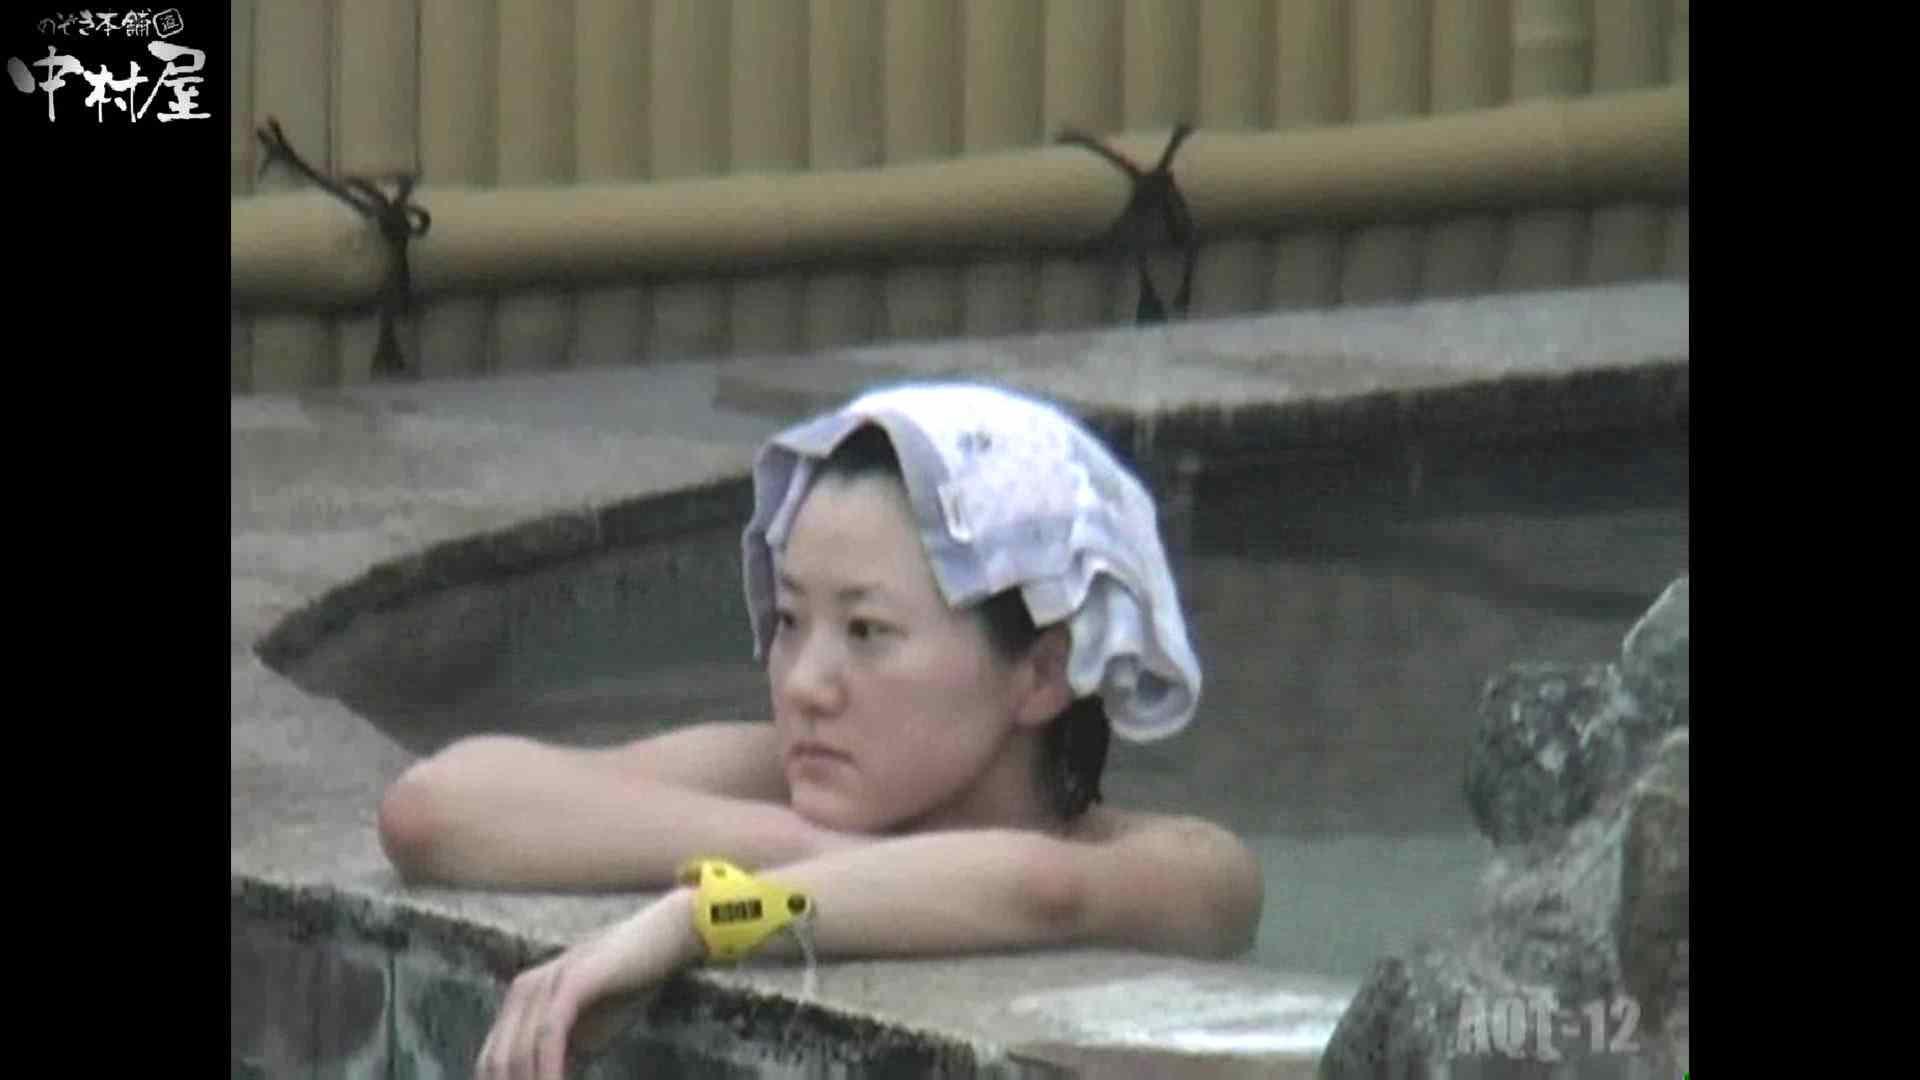 Aquaな露天風呂Vol.876潜入盗撮露天風呂十二判湯 其の三 盗撮師作品  88pic 40